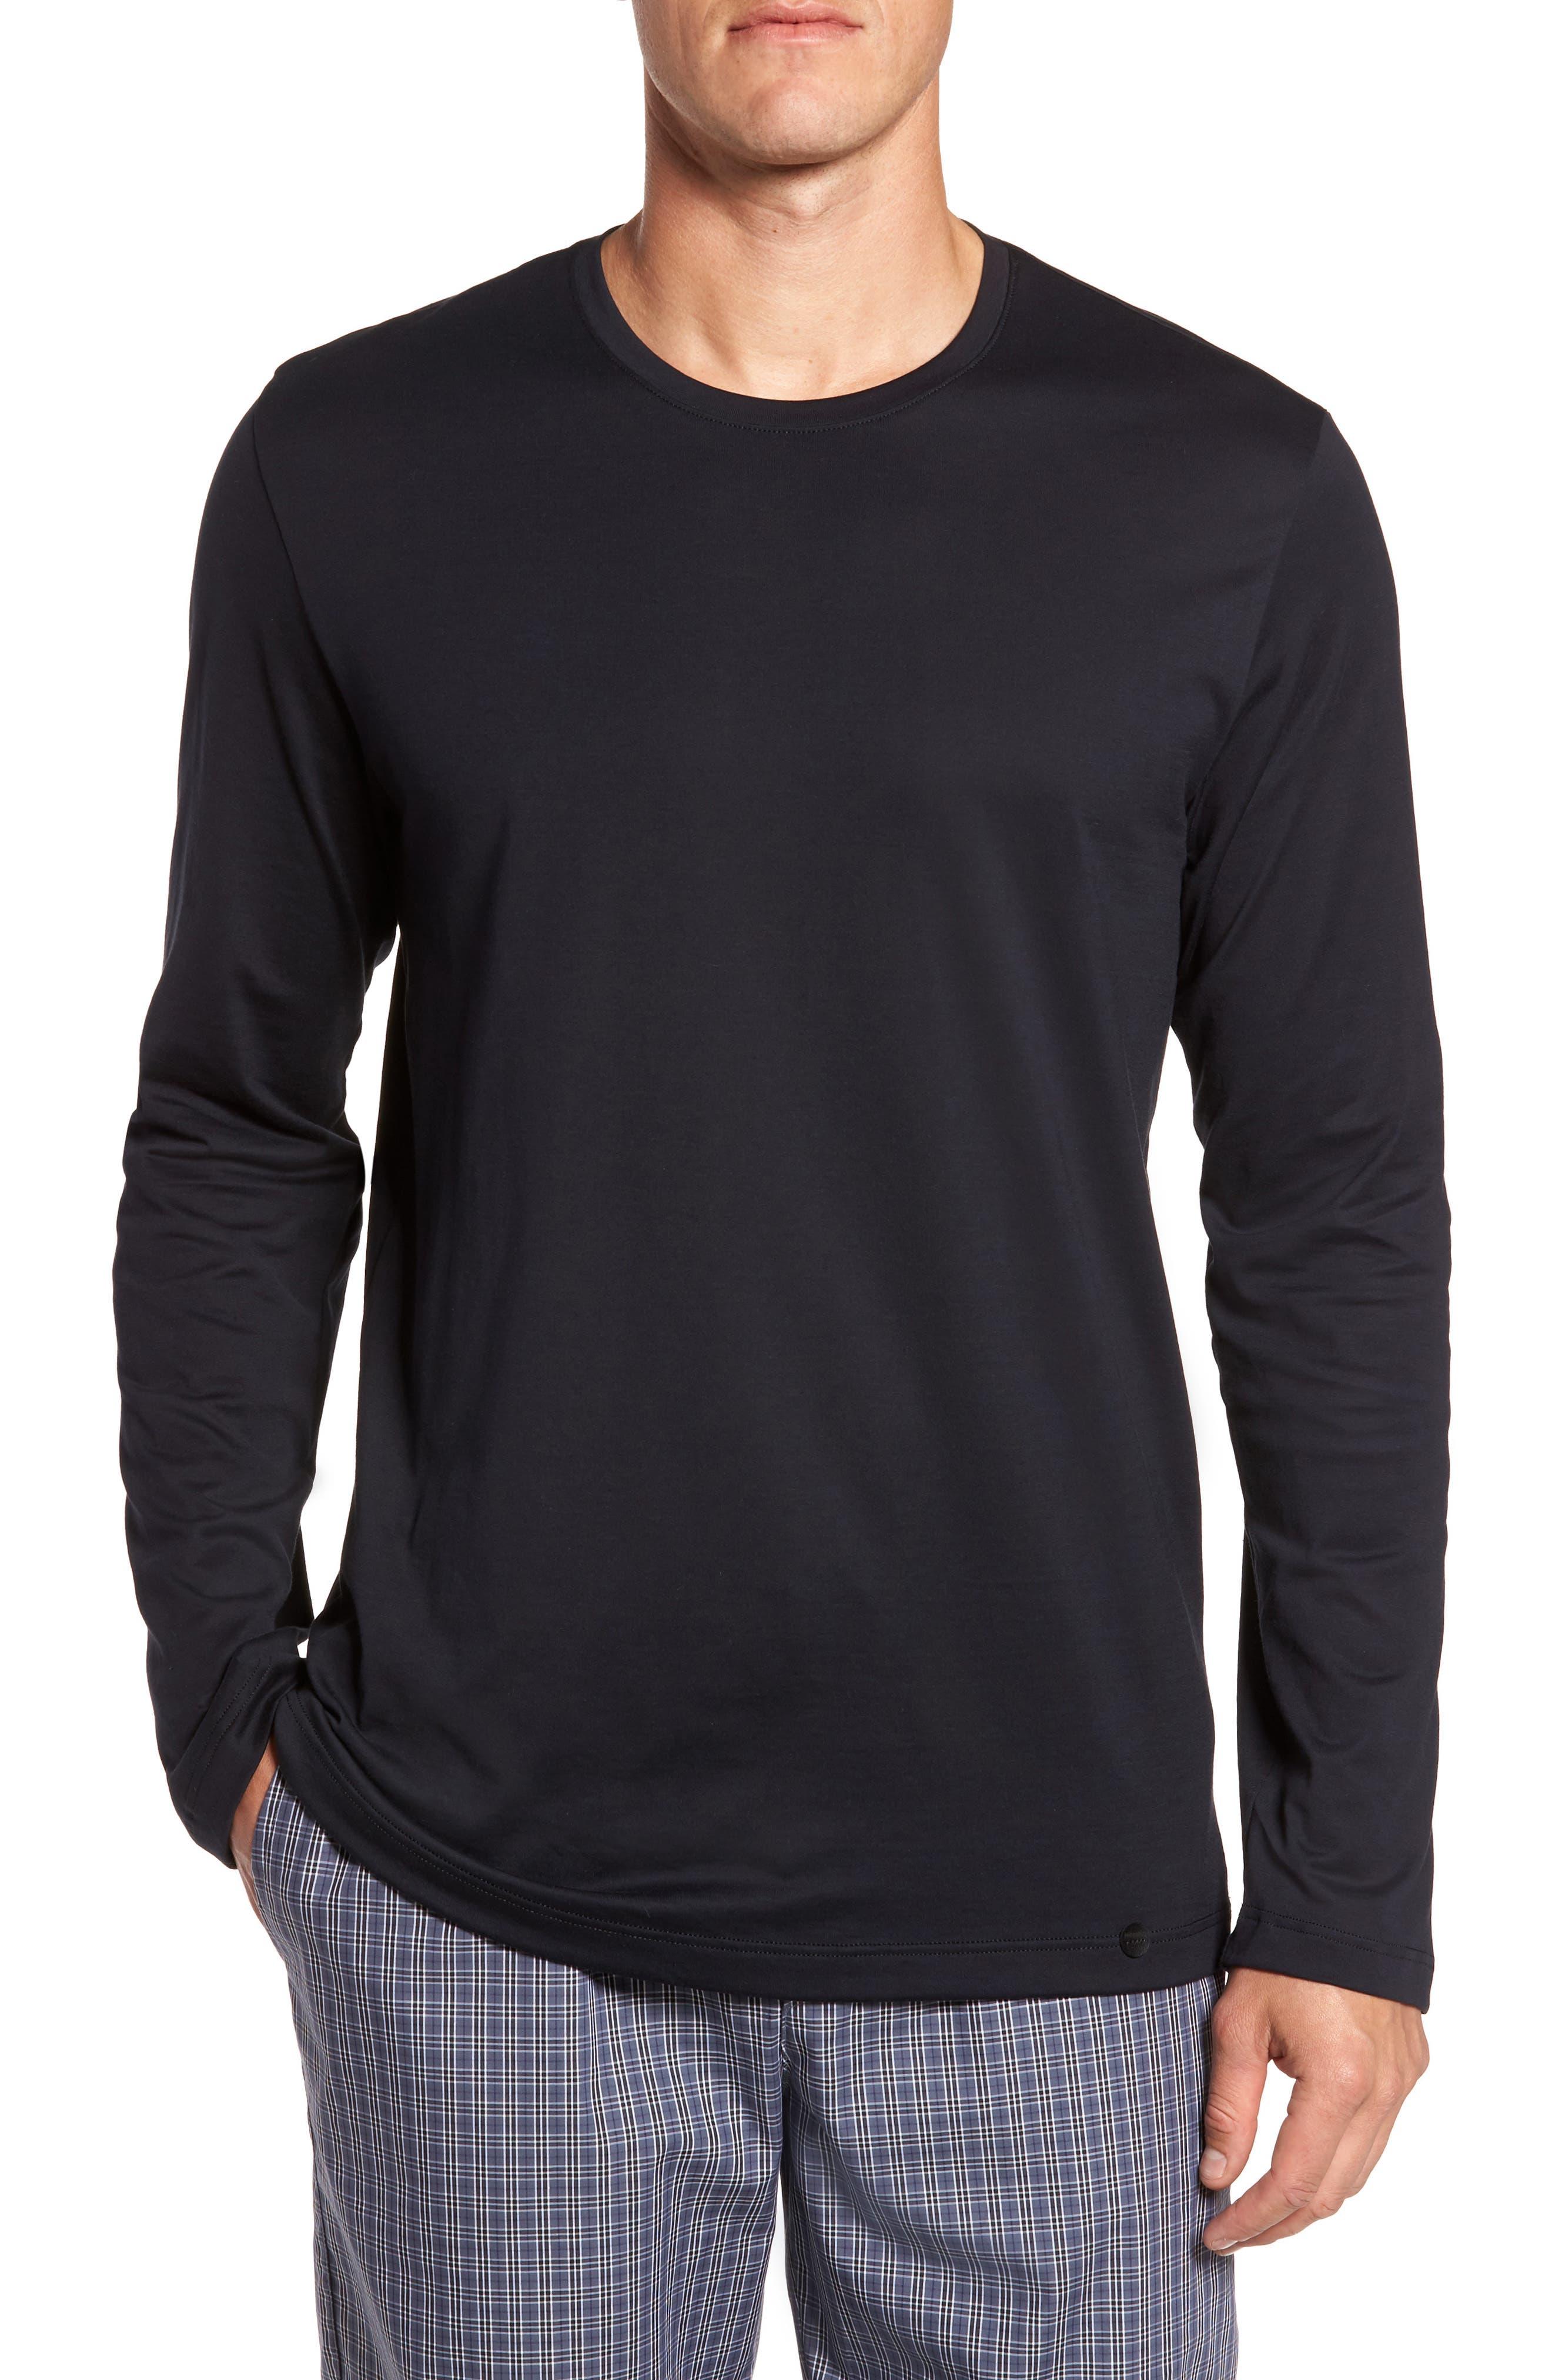 Night & Day Lounge T-Shirt,                             Main thumbnail 1, color,                             BLACK